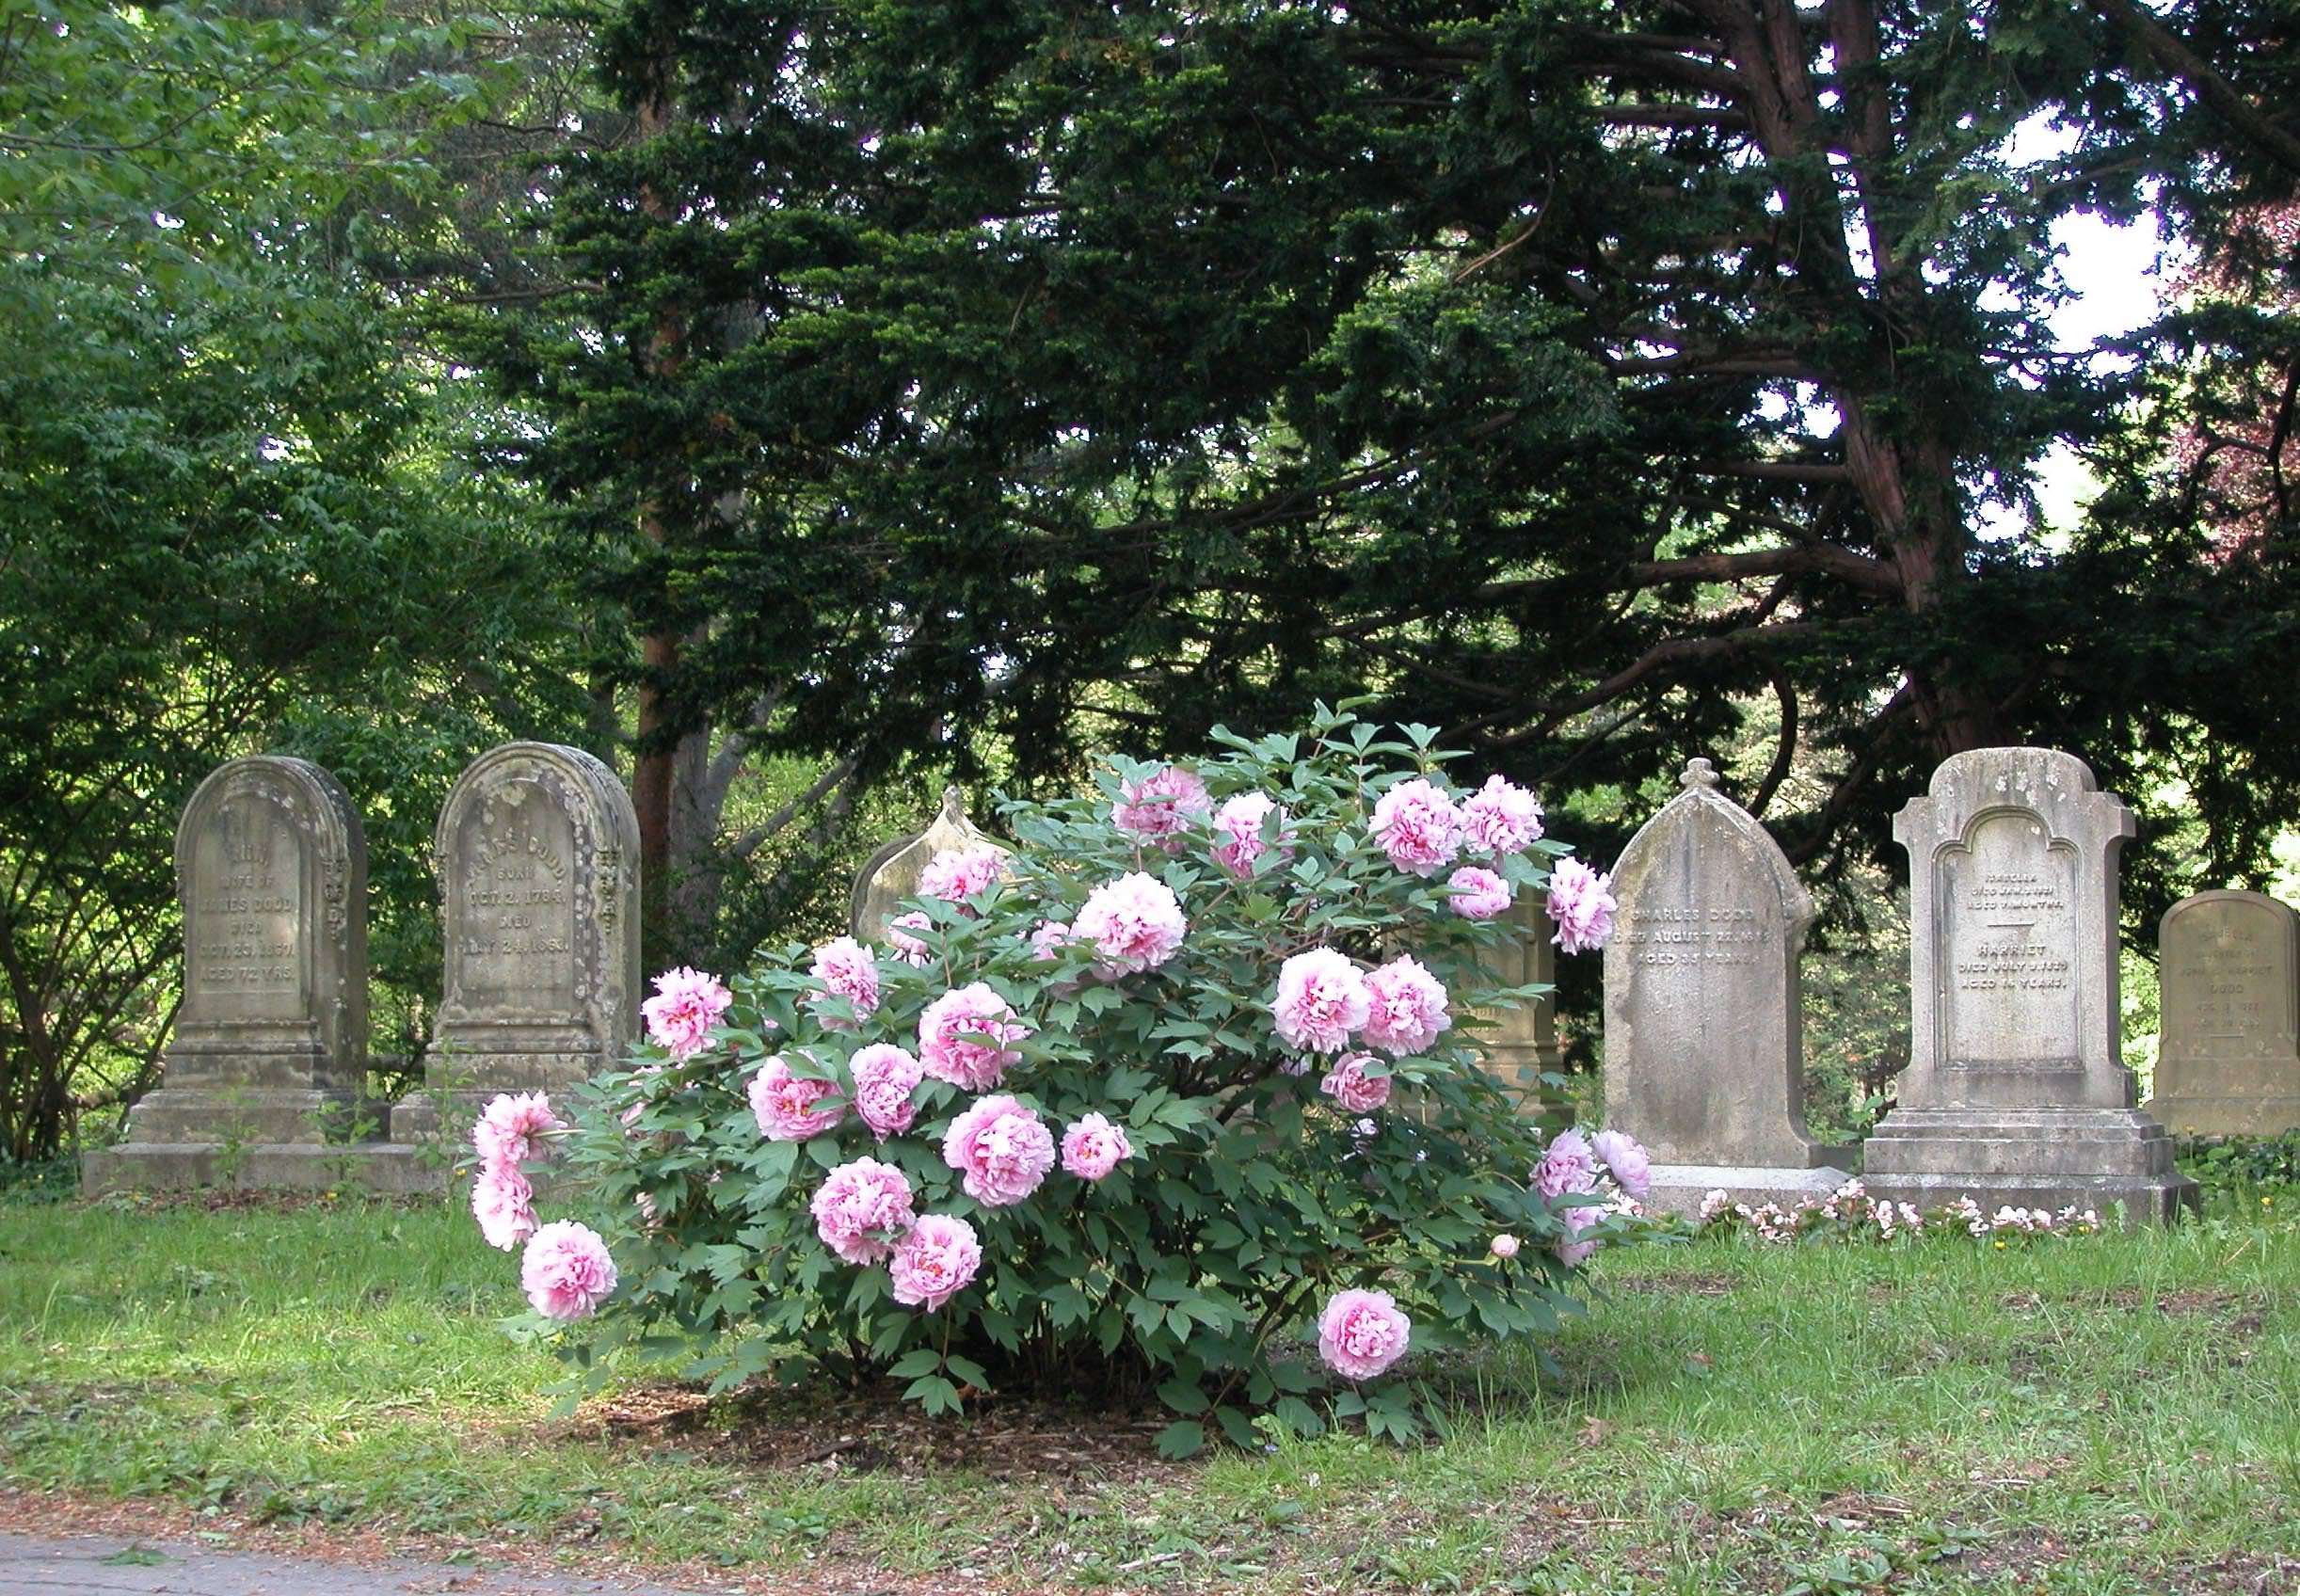 Horticultural Highlight: Paeonia suffruticosa | Mount Auburn Cemetery